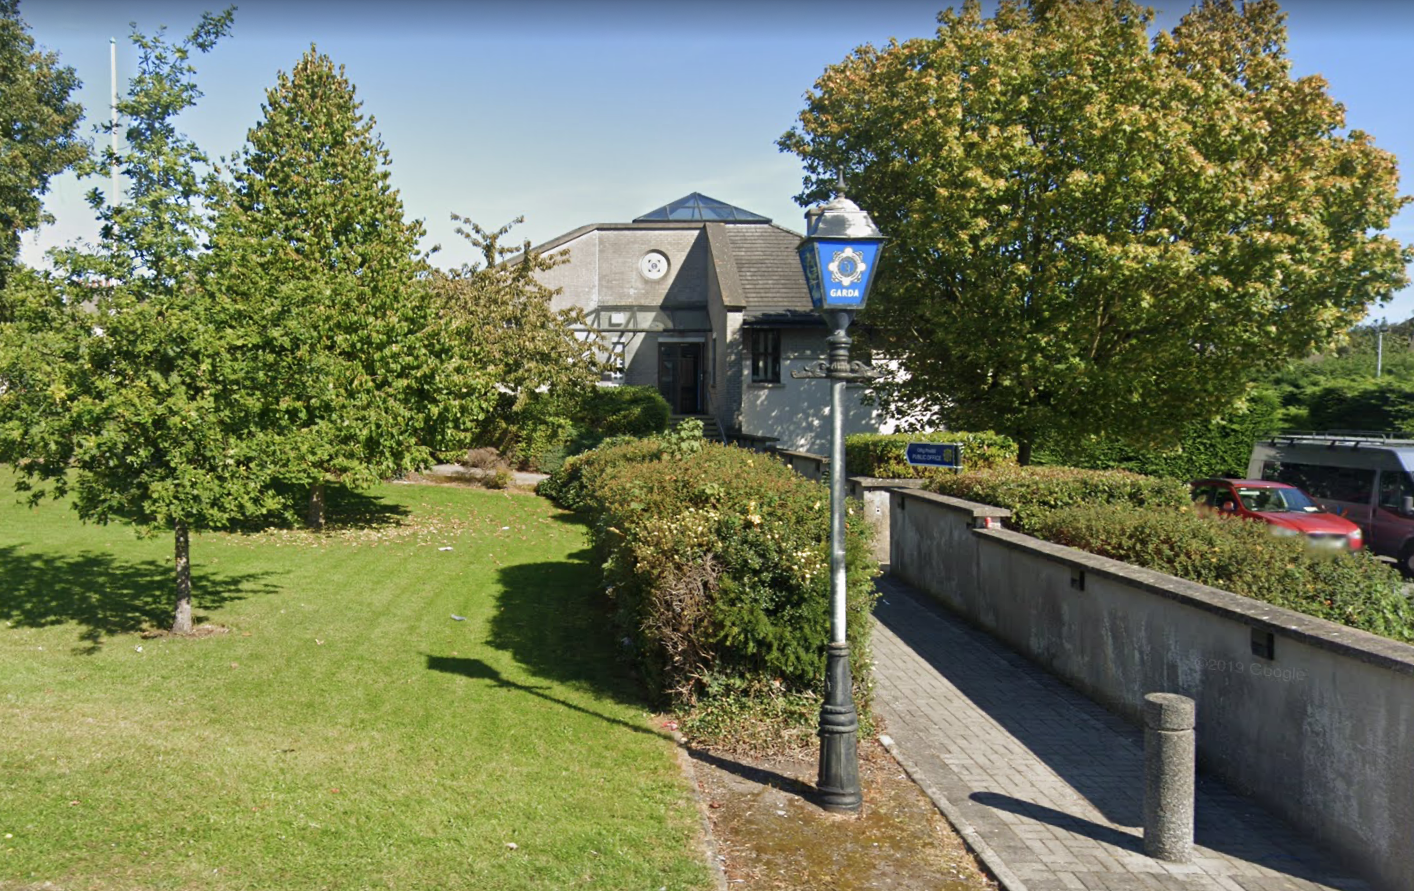 Carlow Garda Station (Google Maps)